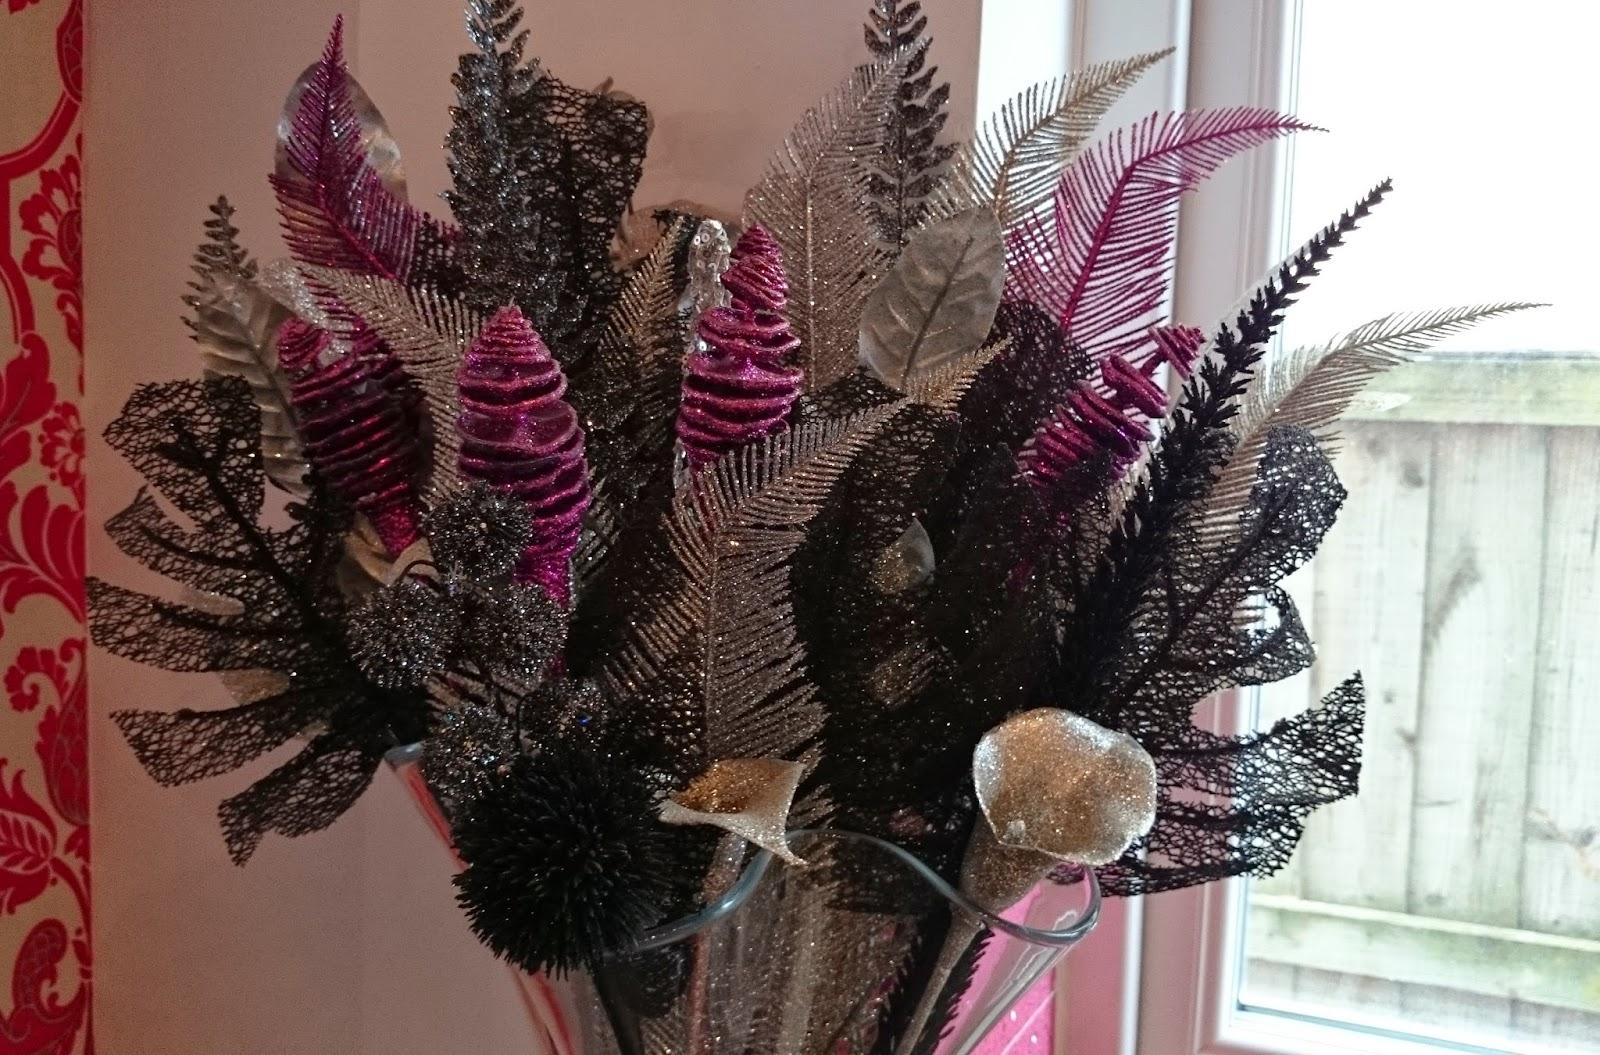 glitter sparkle flowers vase glass home decor ideas